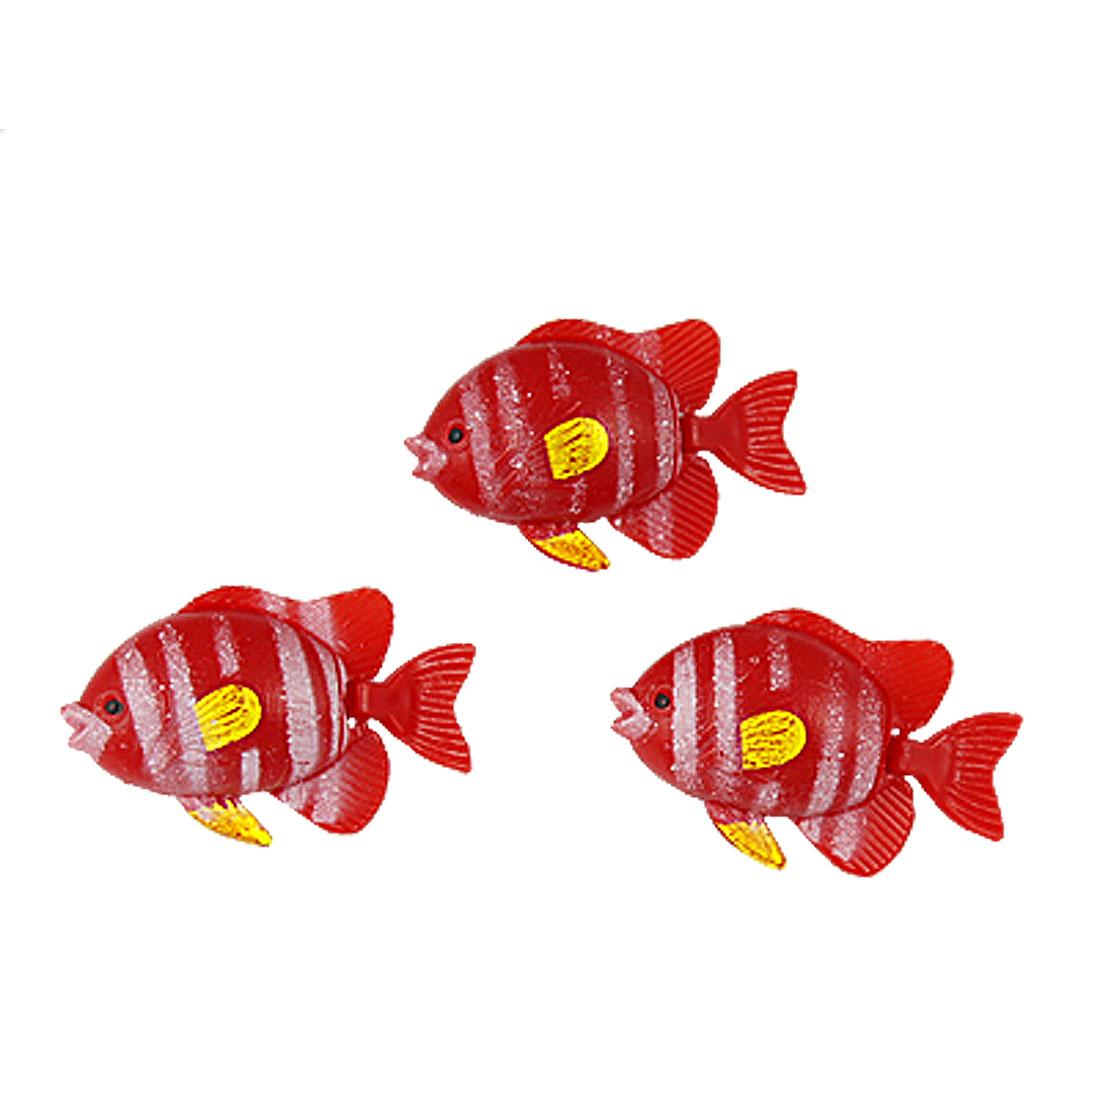 "1.2"" Length Striped Red Plastic Mini Fish Ornament for Aquarium 3 Pcs"